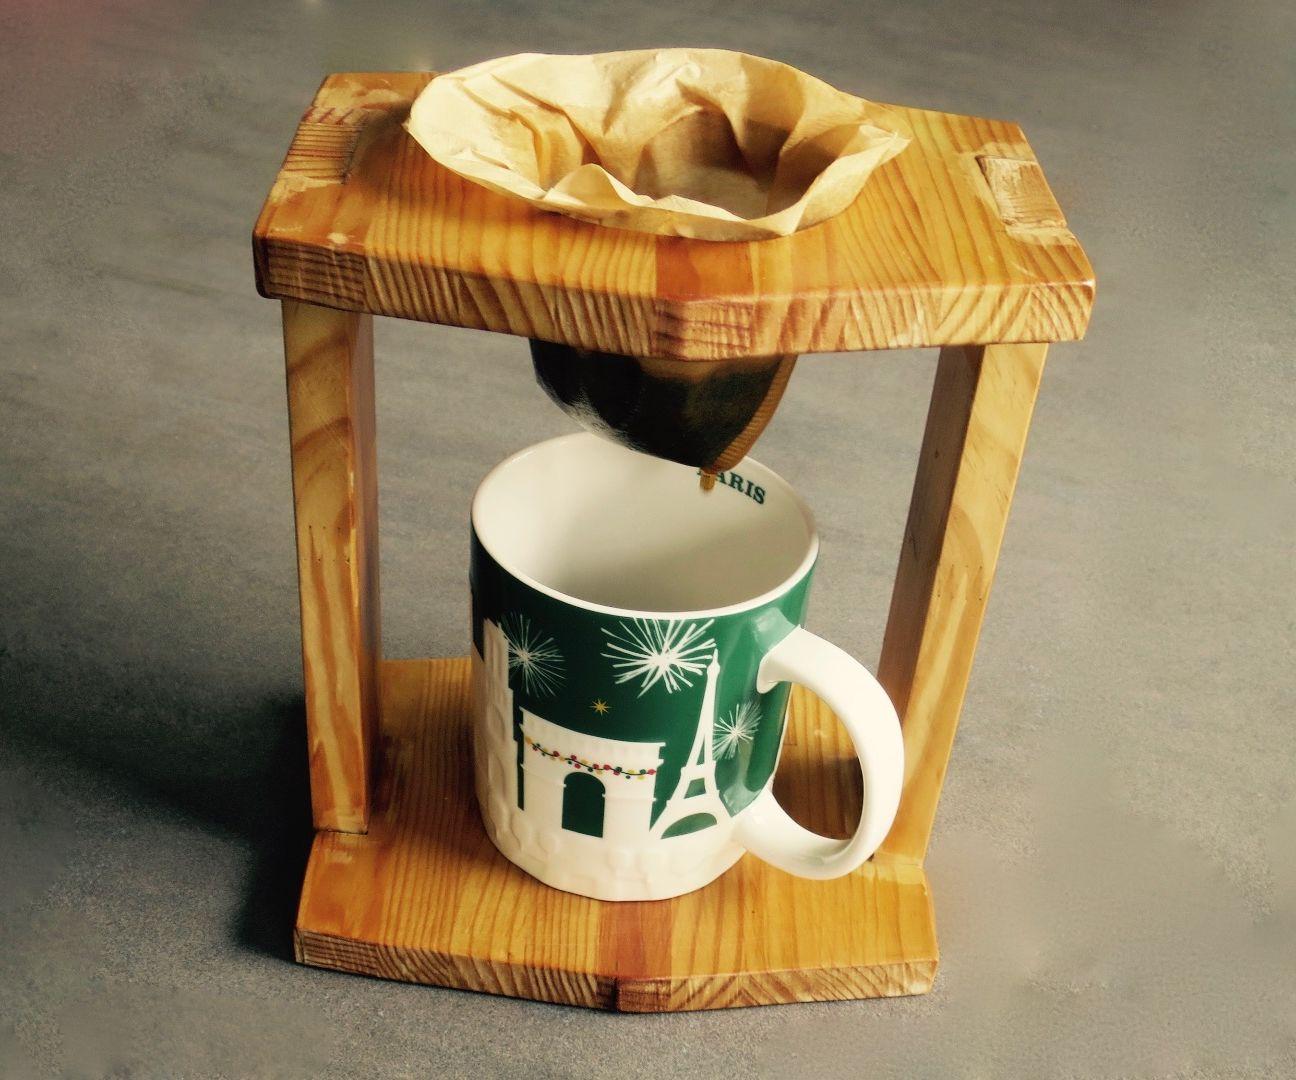 Wood Coffee Maker